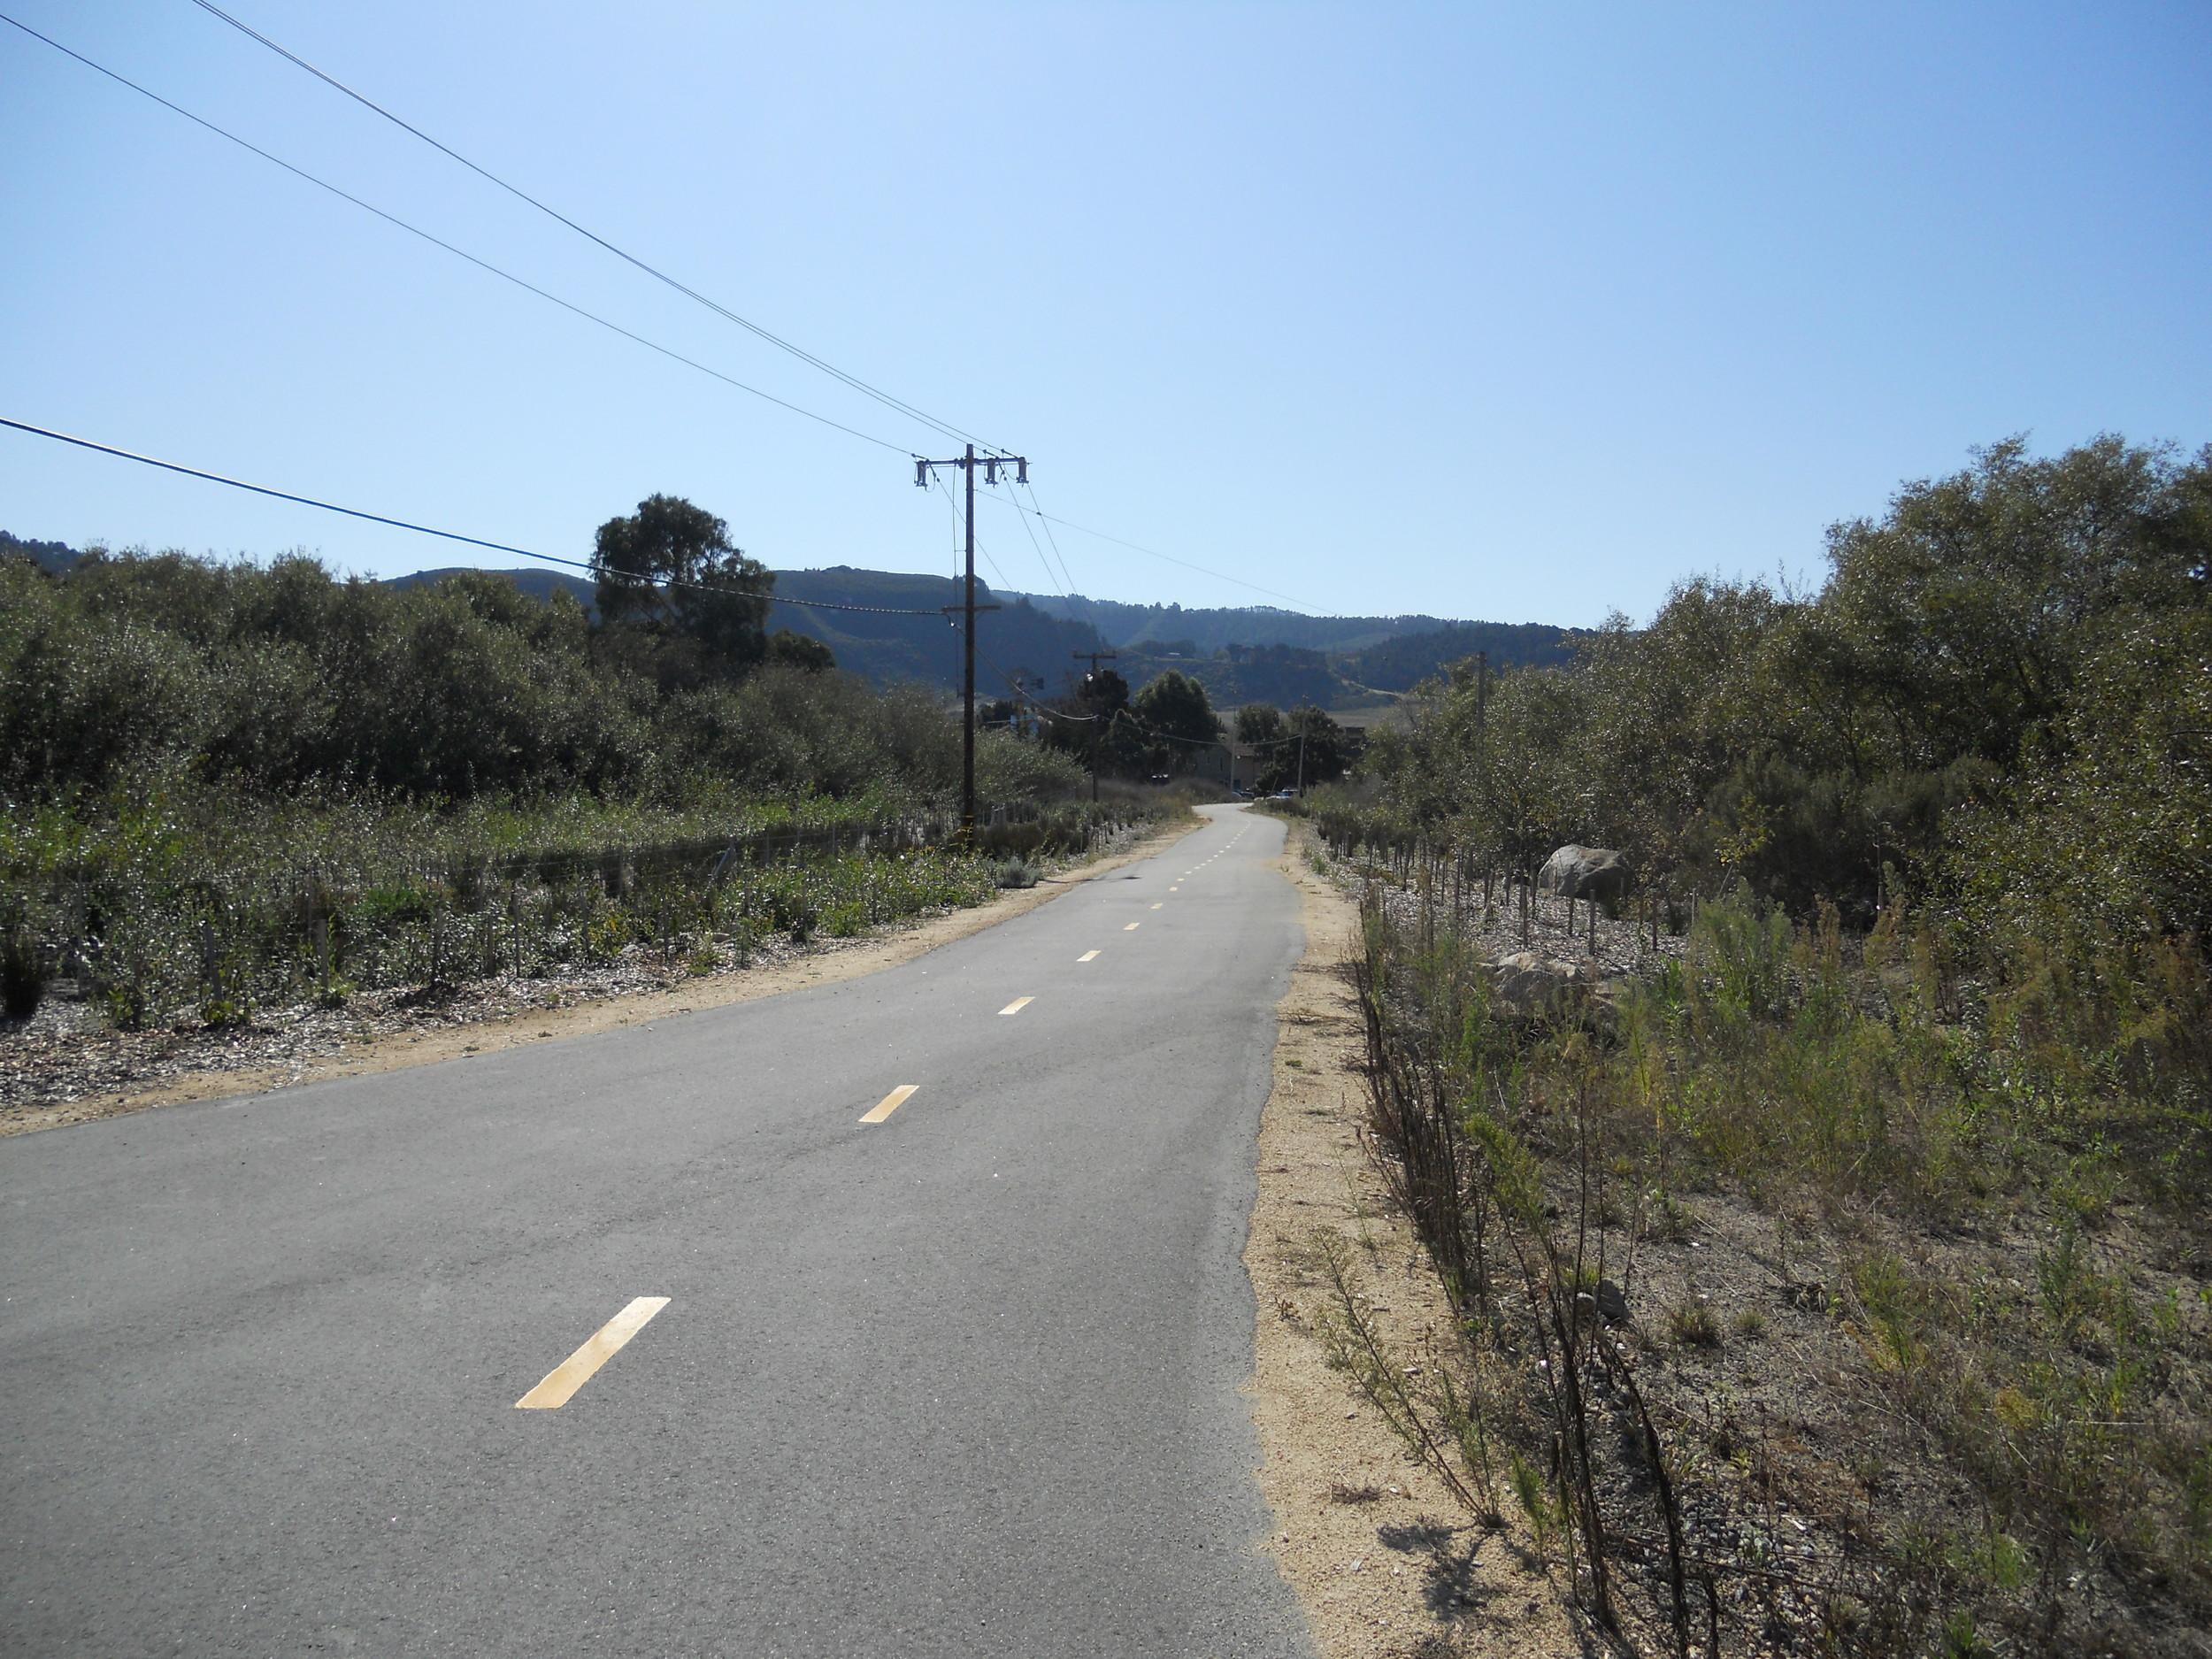 Carmel Hill and River Class I Bicycle Trail Riparian Restoration Progress (November 8, 2011)